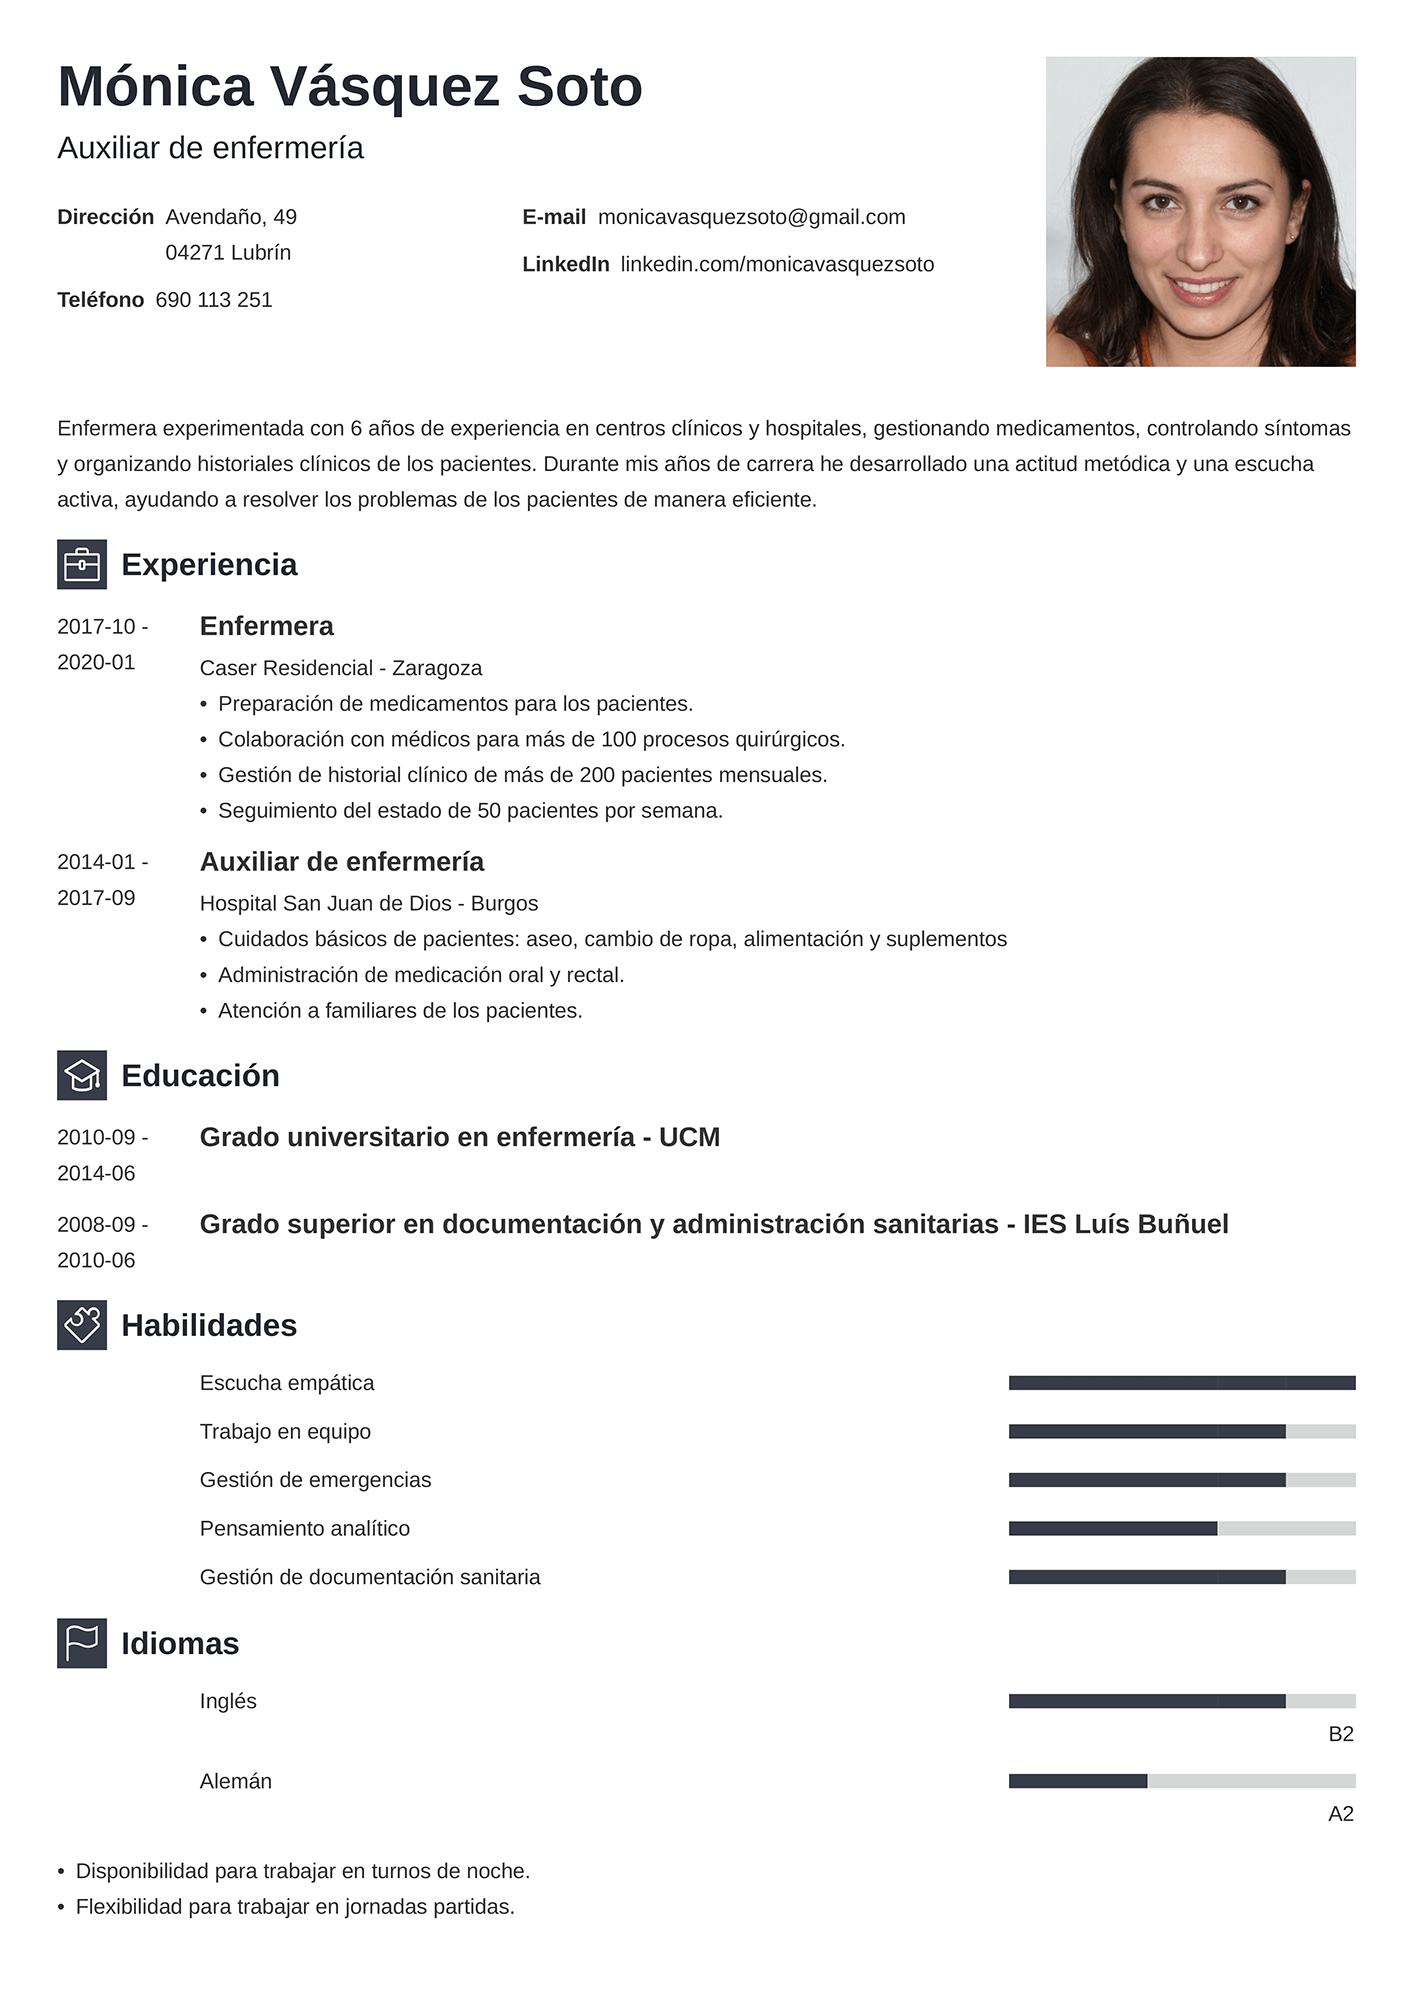 Currículum de enfermera